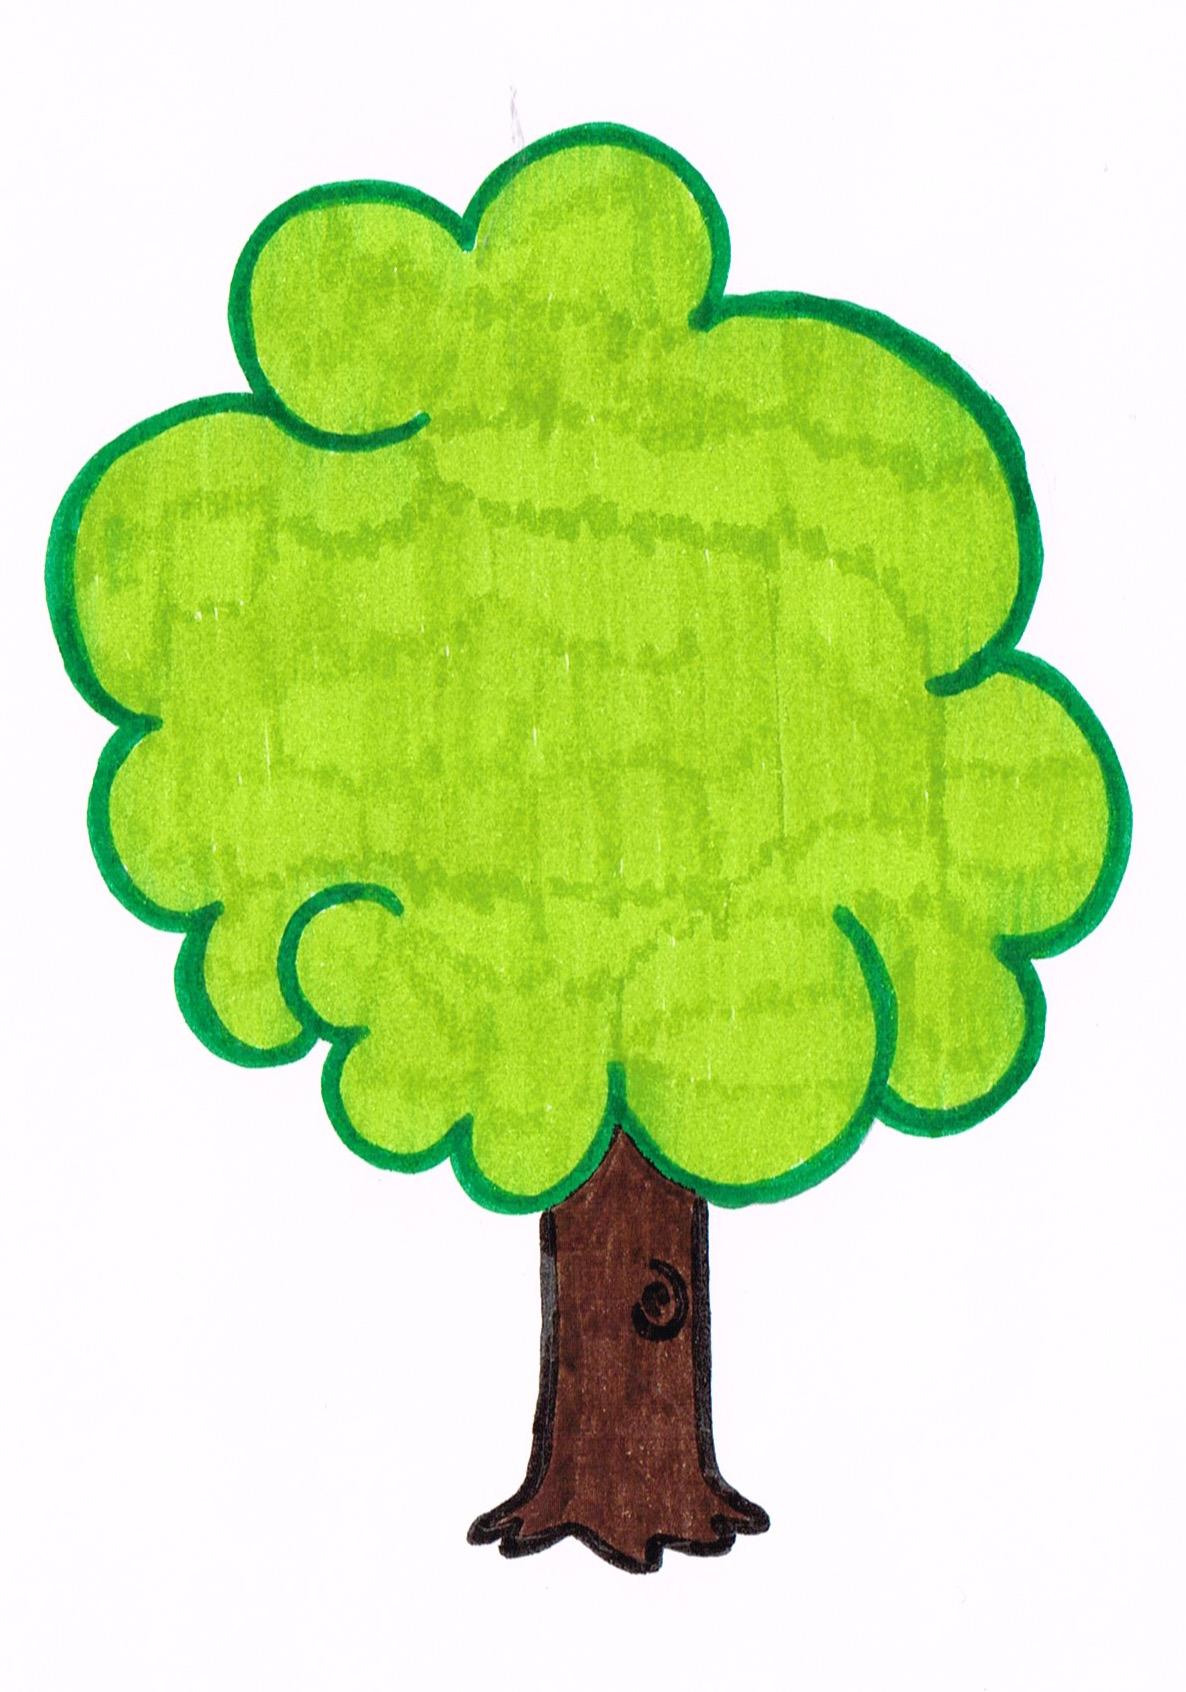 Scenarios/assets/Baum 1.jpeg